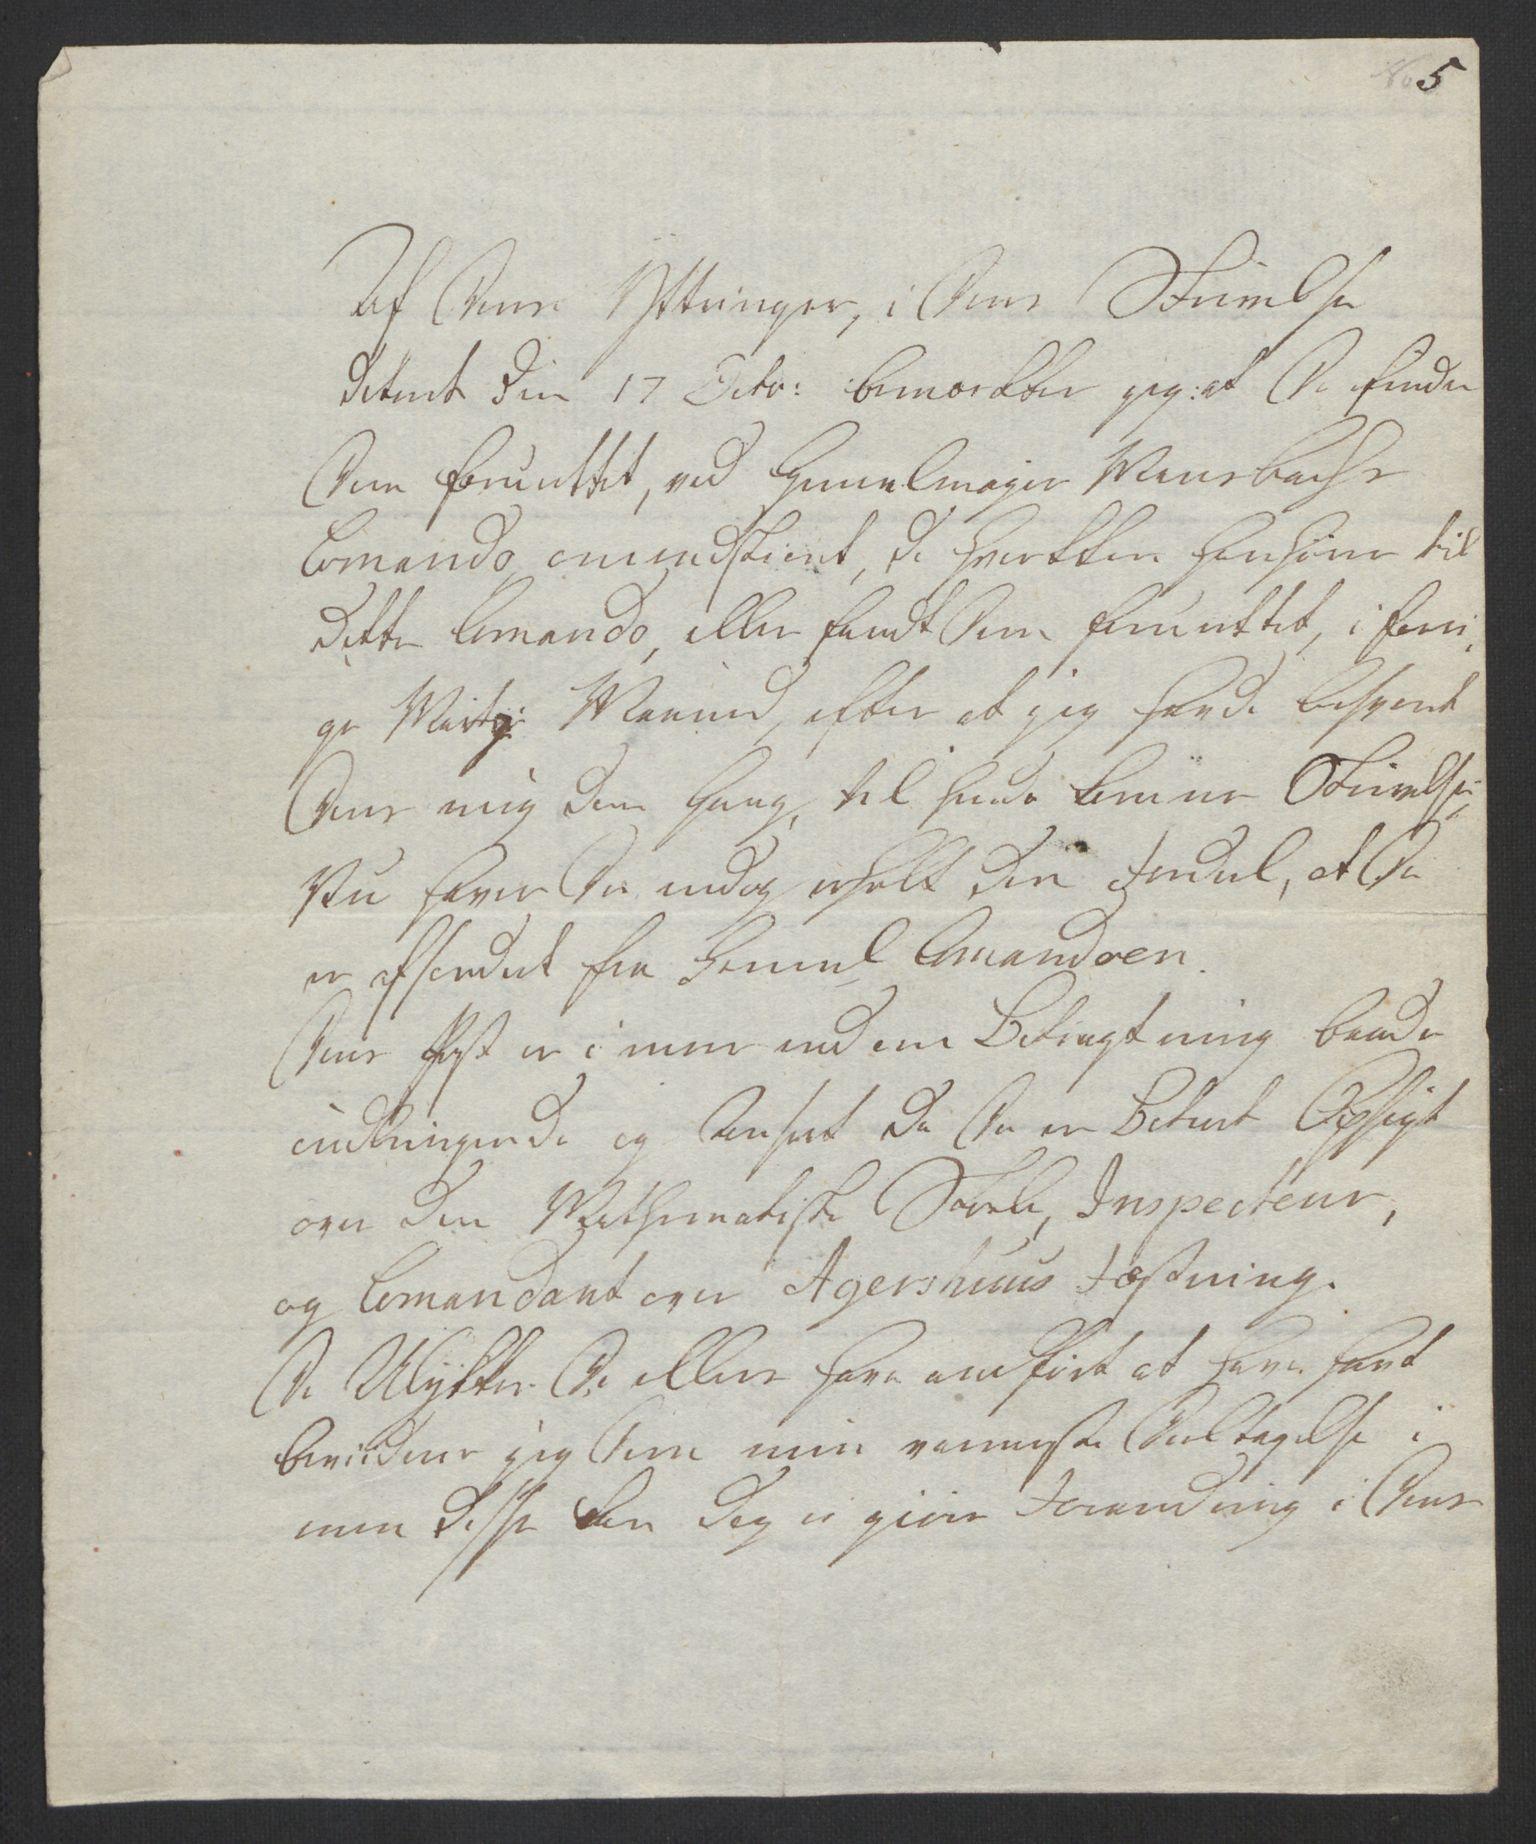 RA, Hesselberg, Hans Jacob Henning, F/L0001: --, 1759-1809, s. 83